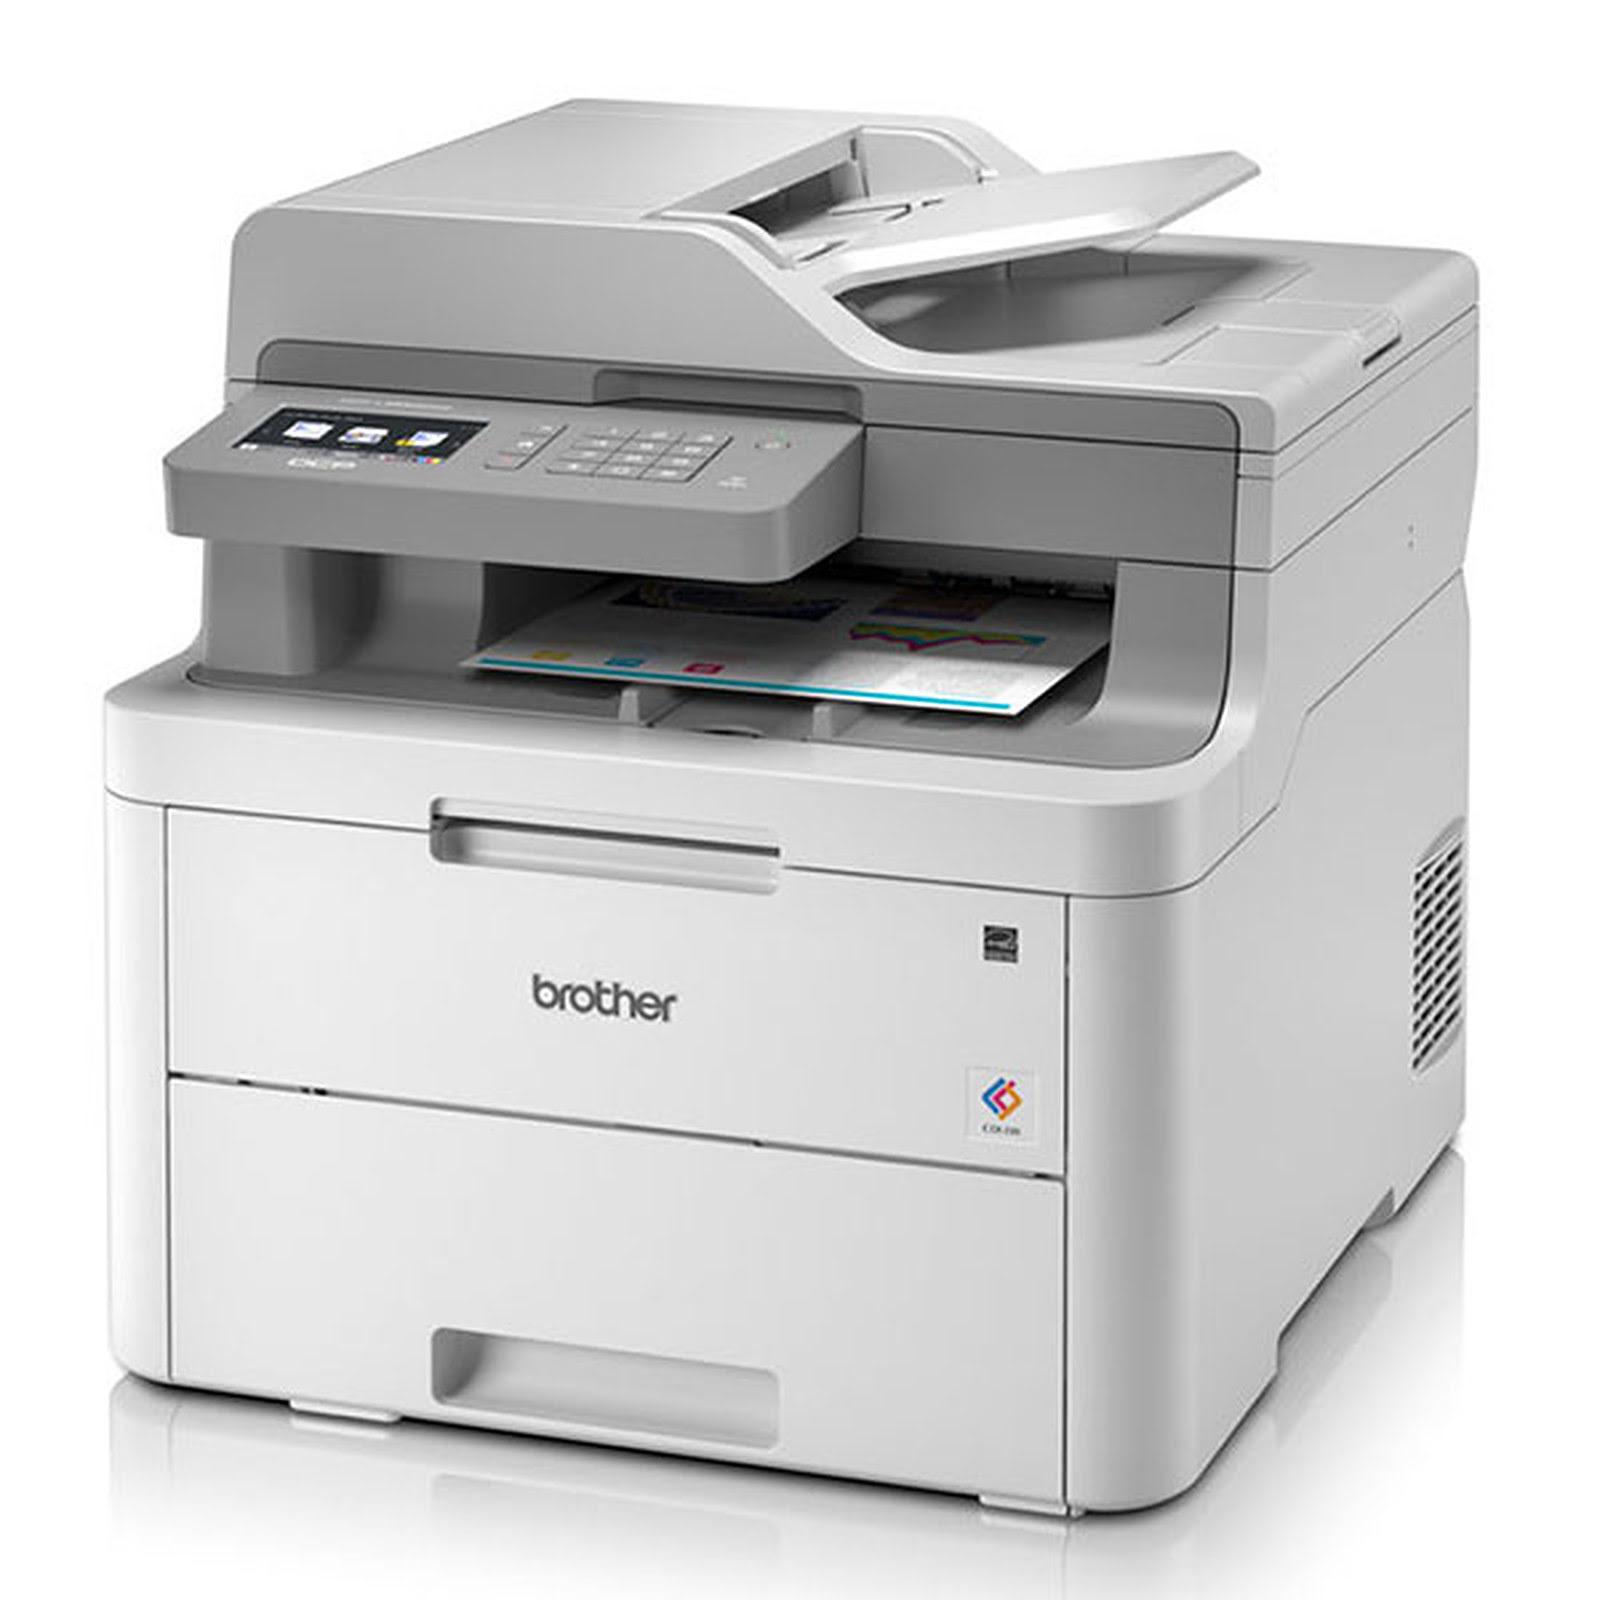 Imprimante multifonction Brother DCP-L3550CDW - Cybertek.fr - 1